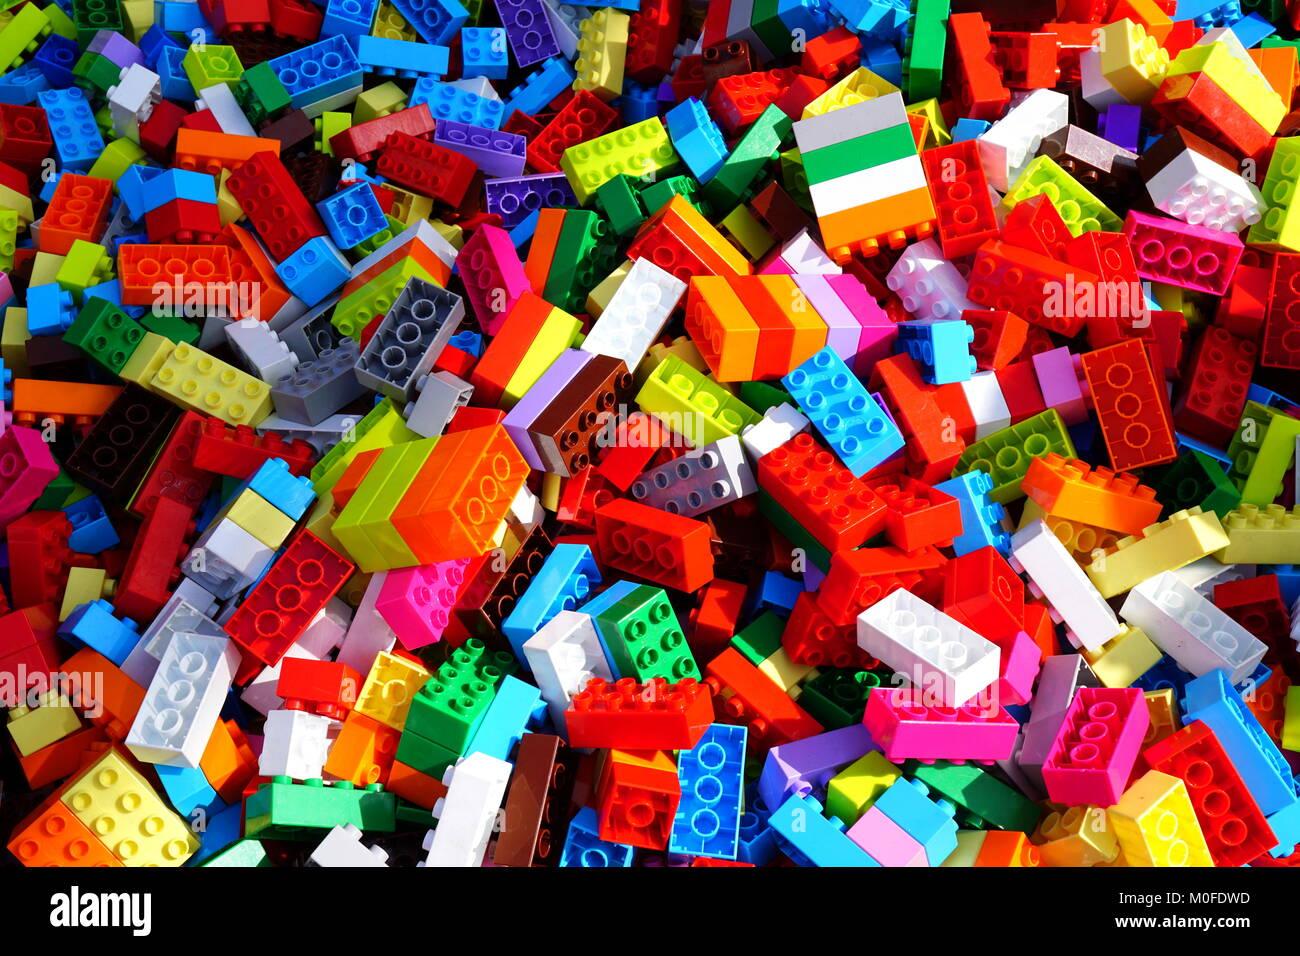 Lego Assorted Building Blocks